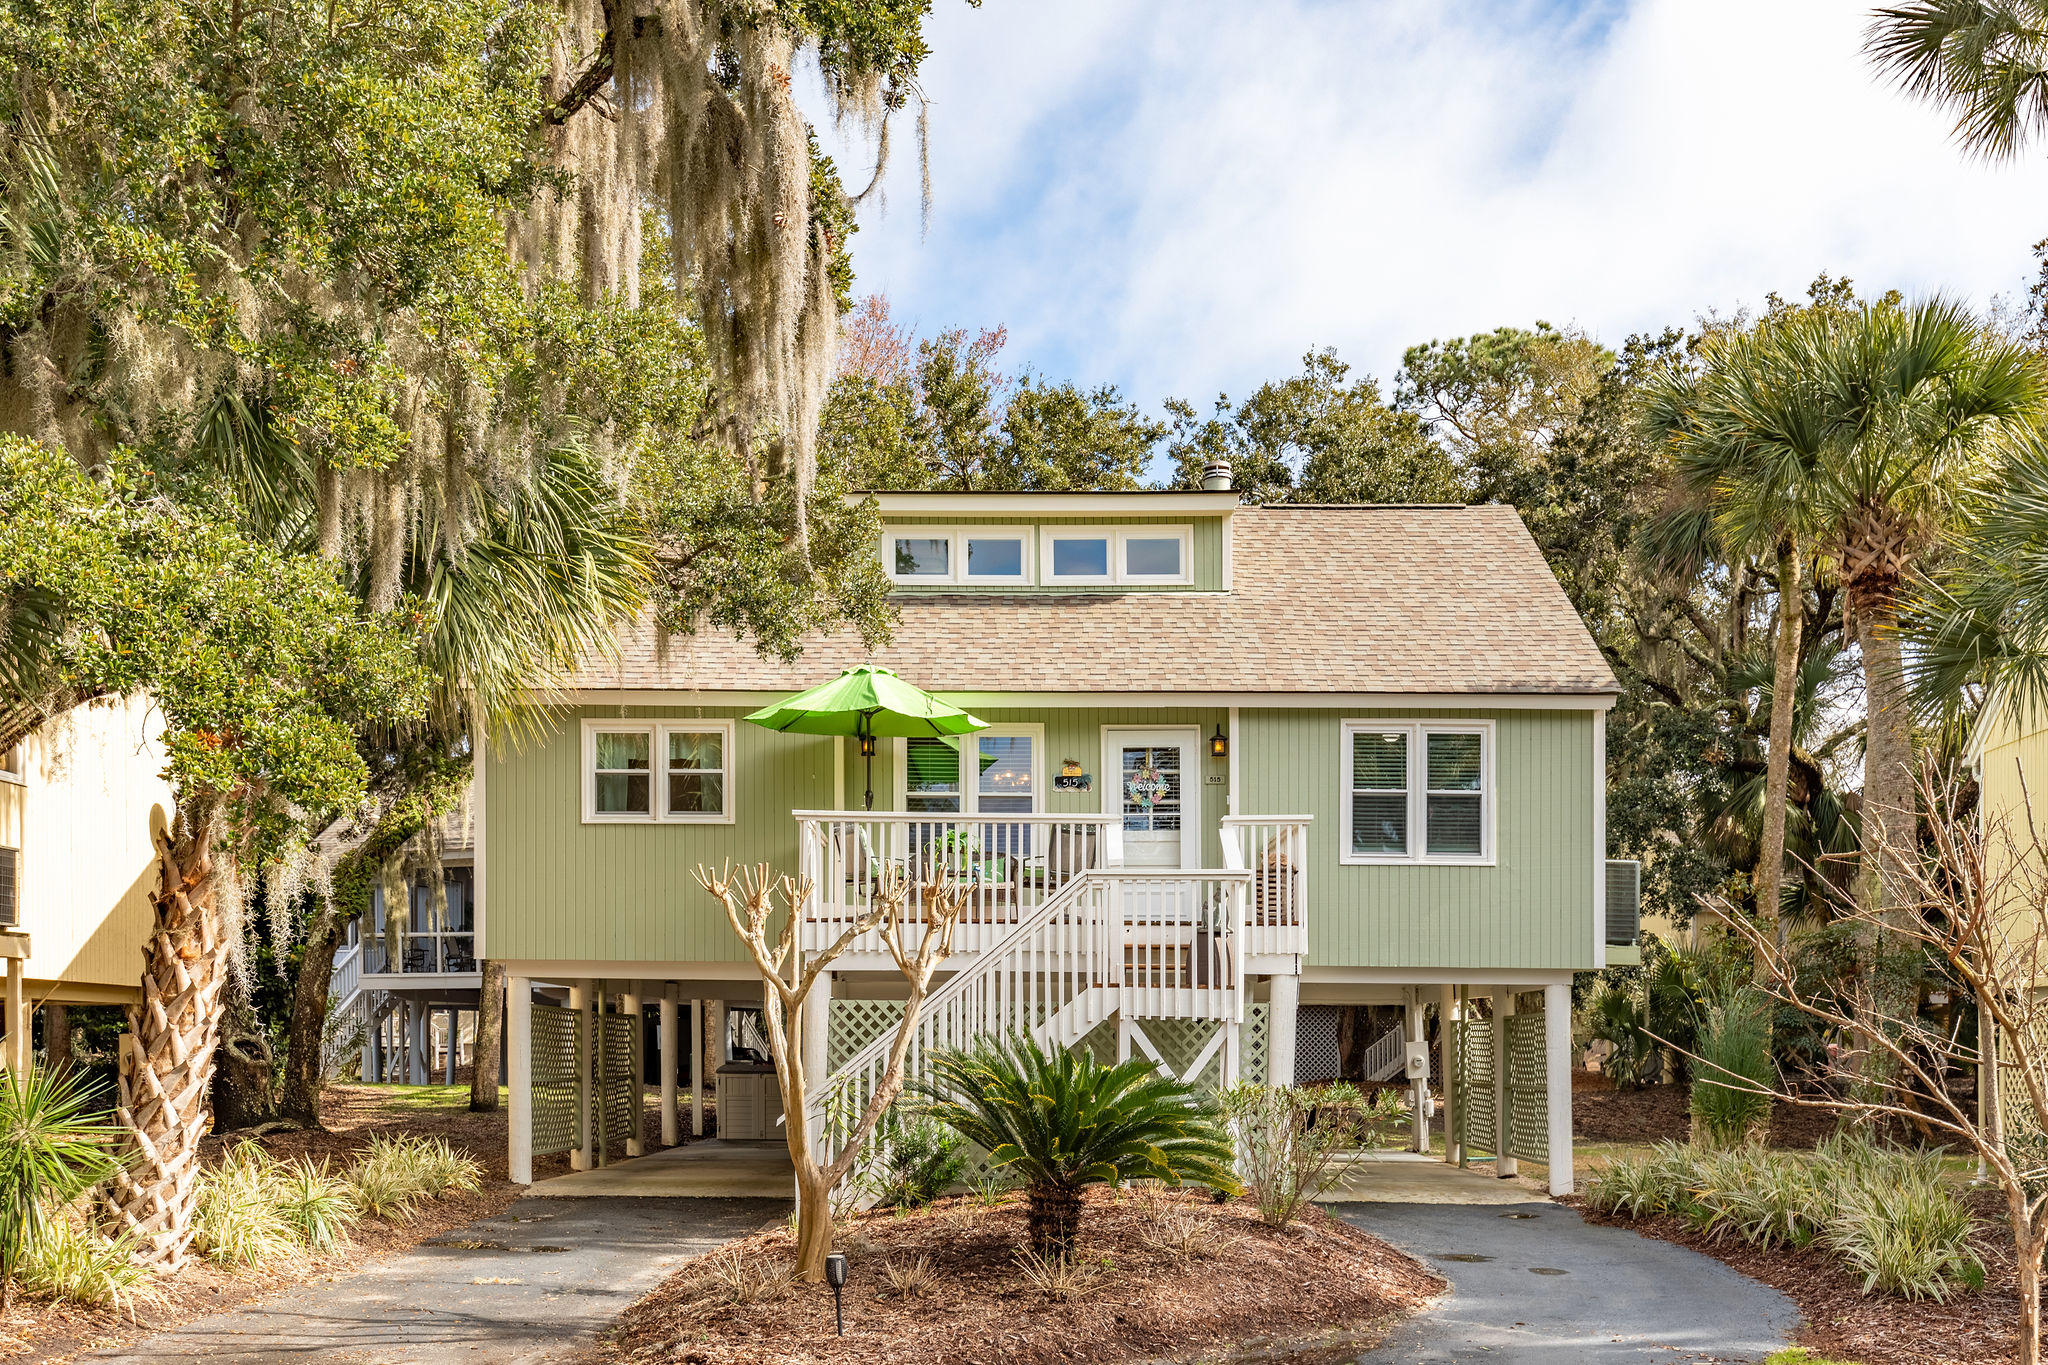 Seabrook Island Homes For Sale - 515 Cobby Creek, Seabrook Island, SC - 44